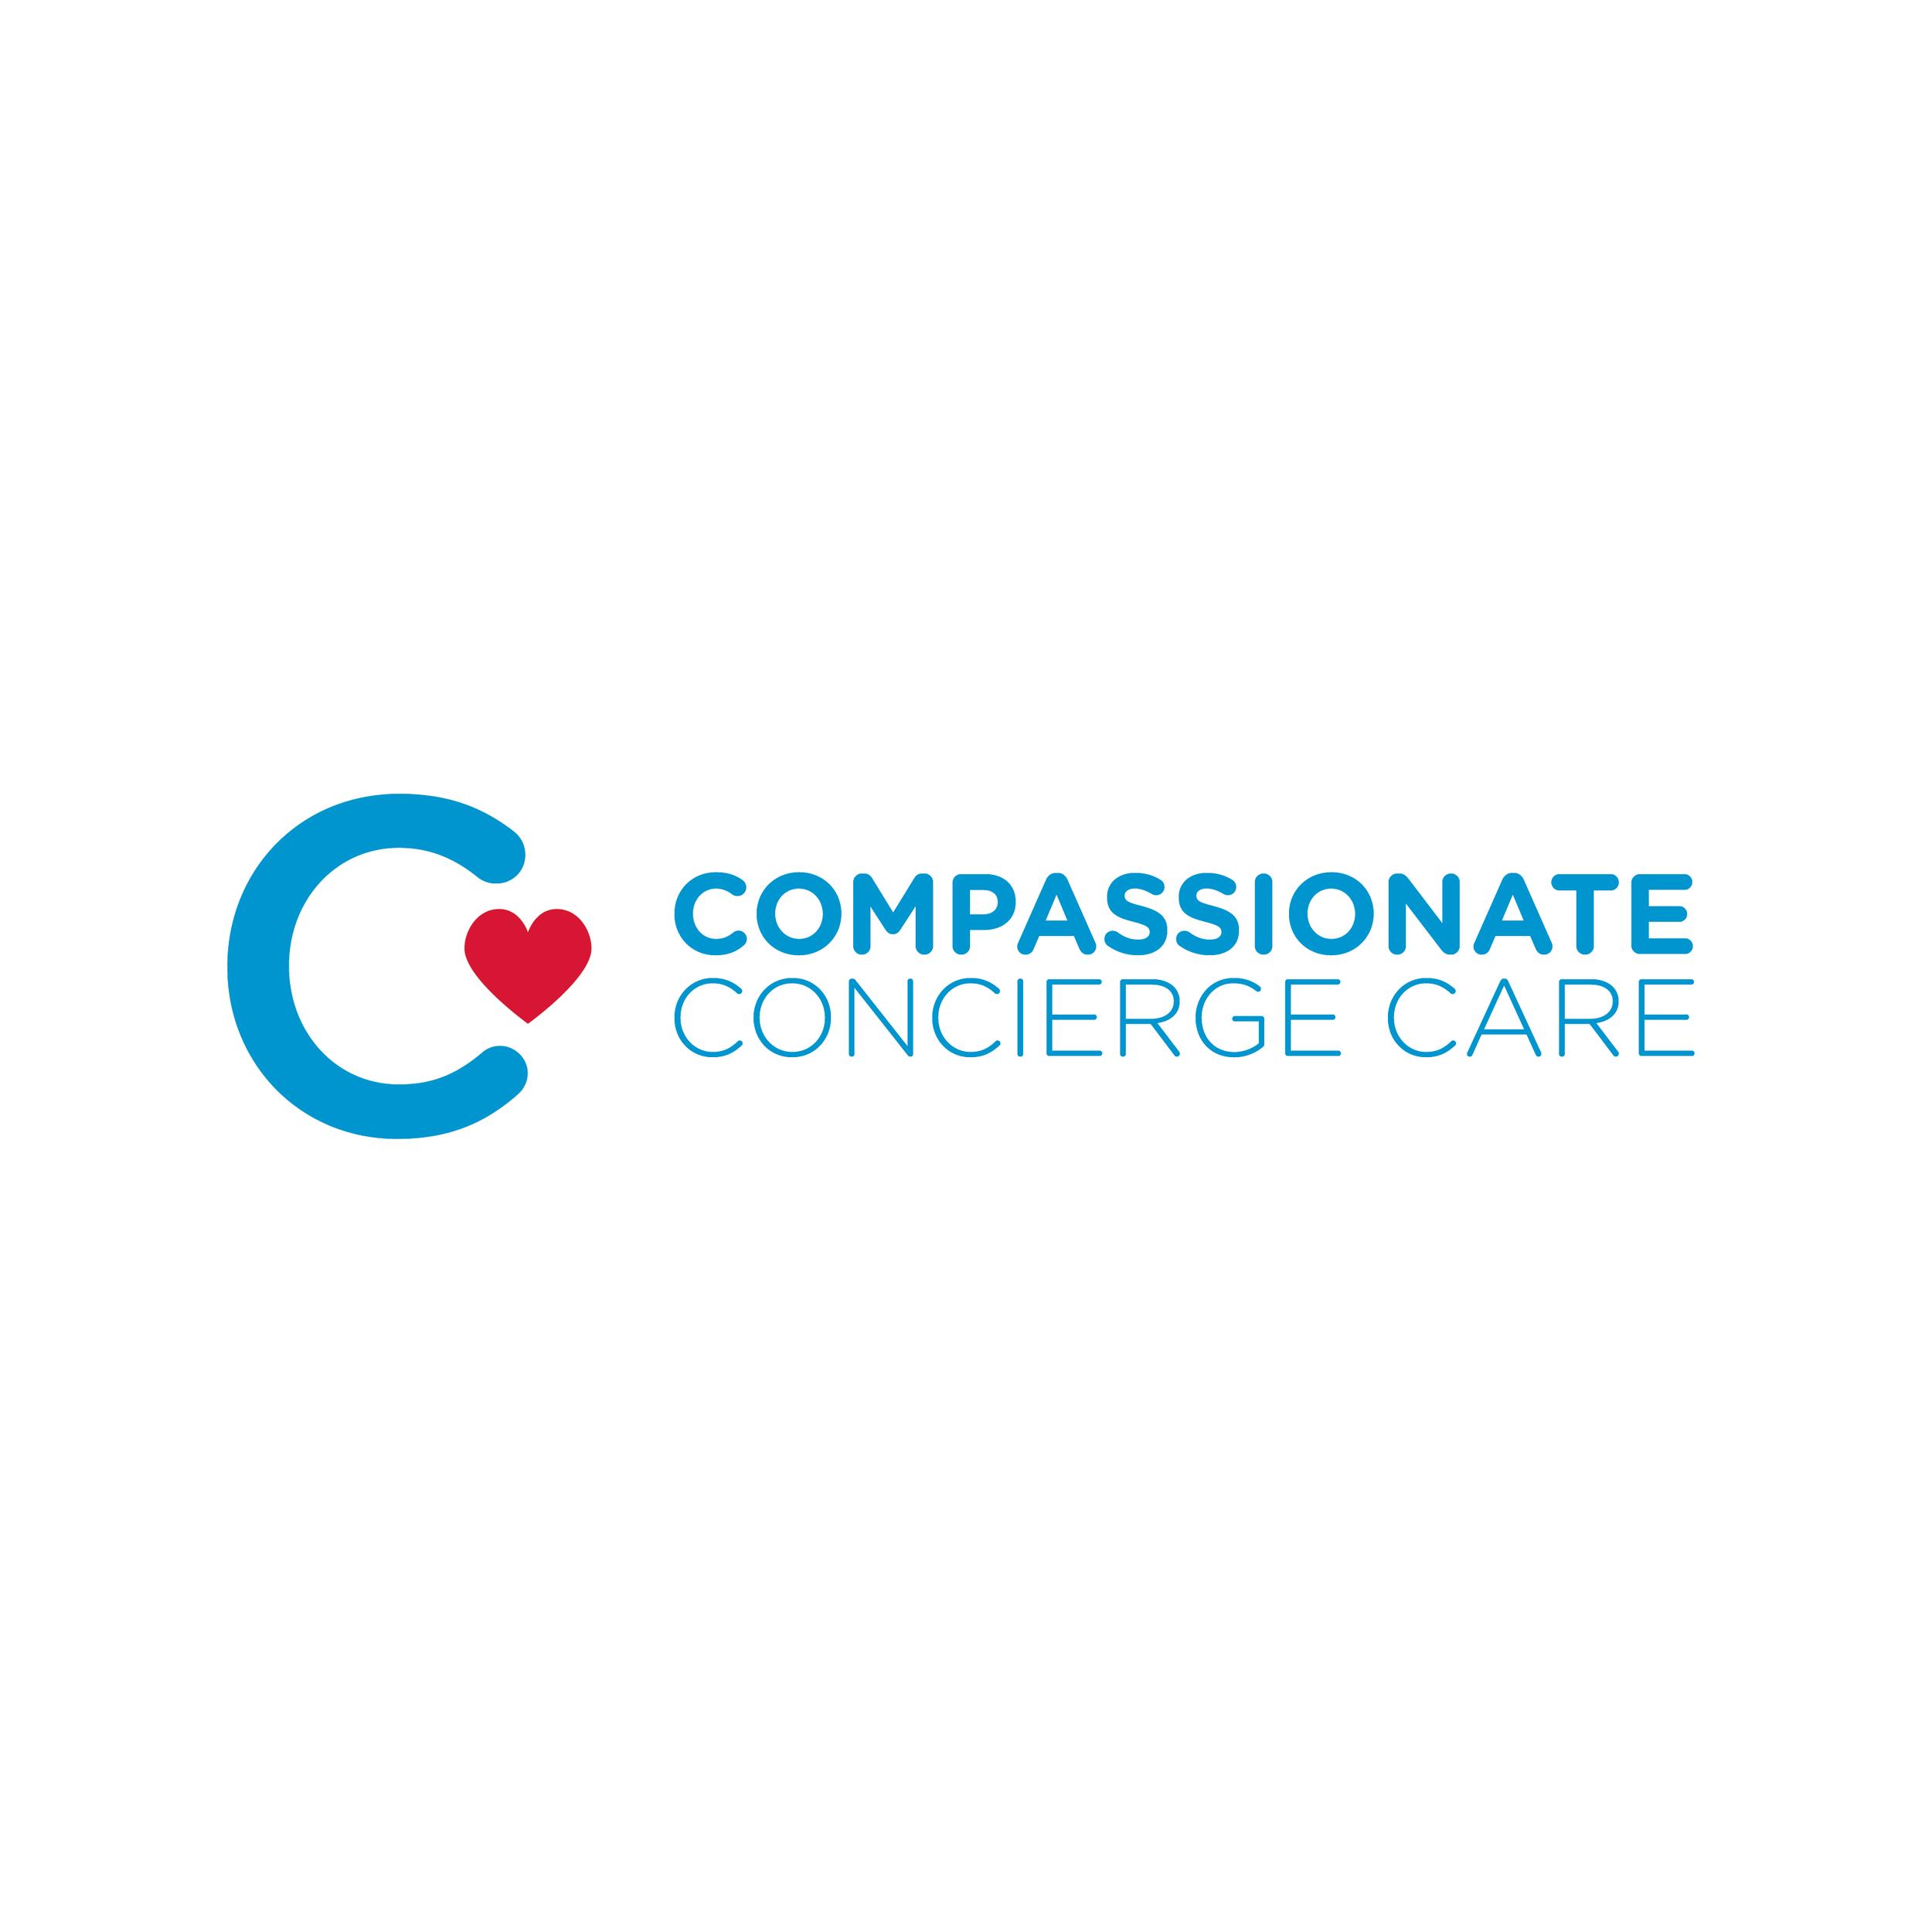 CompassionateConciergeCare_logo.png